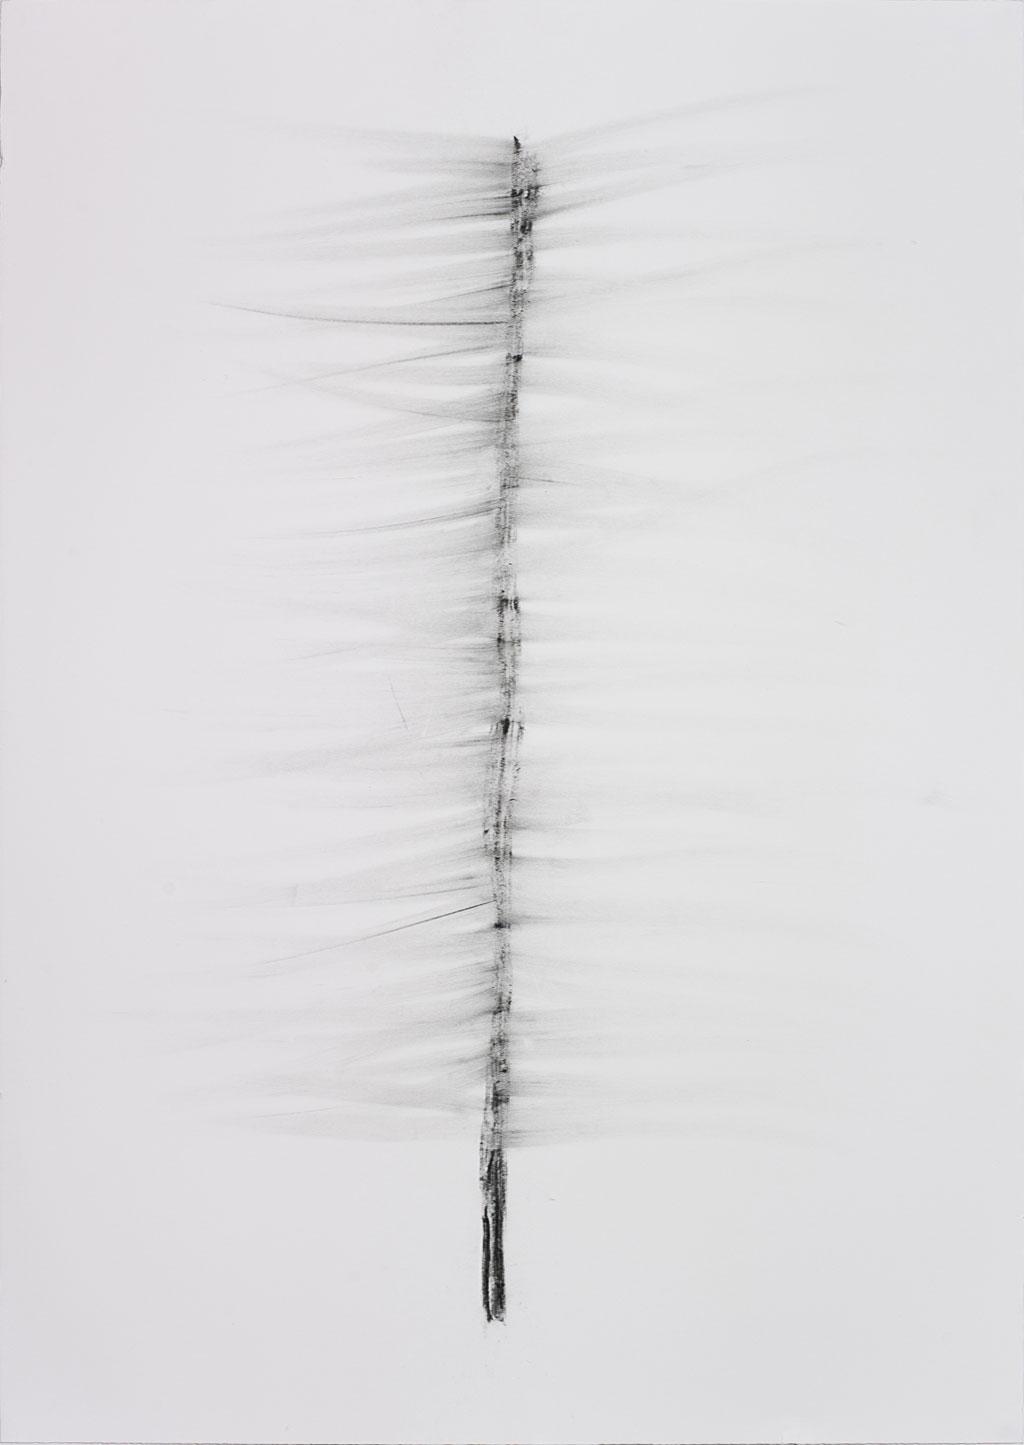 Chiara Dellerba, Untitled #6, mixed media on paper, cm 29,7x21, 2014